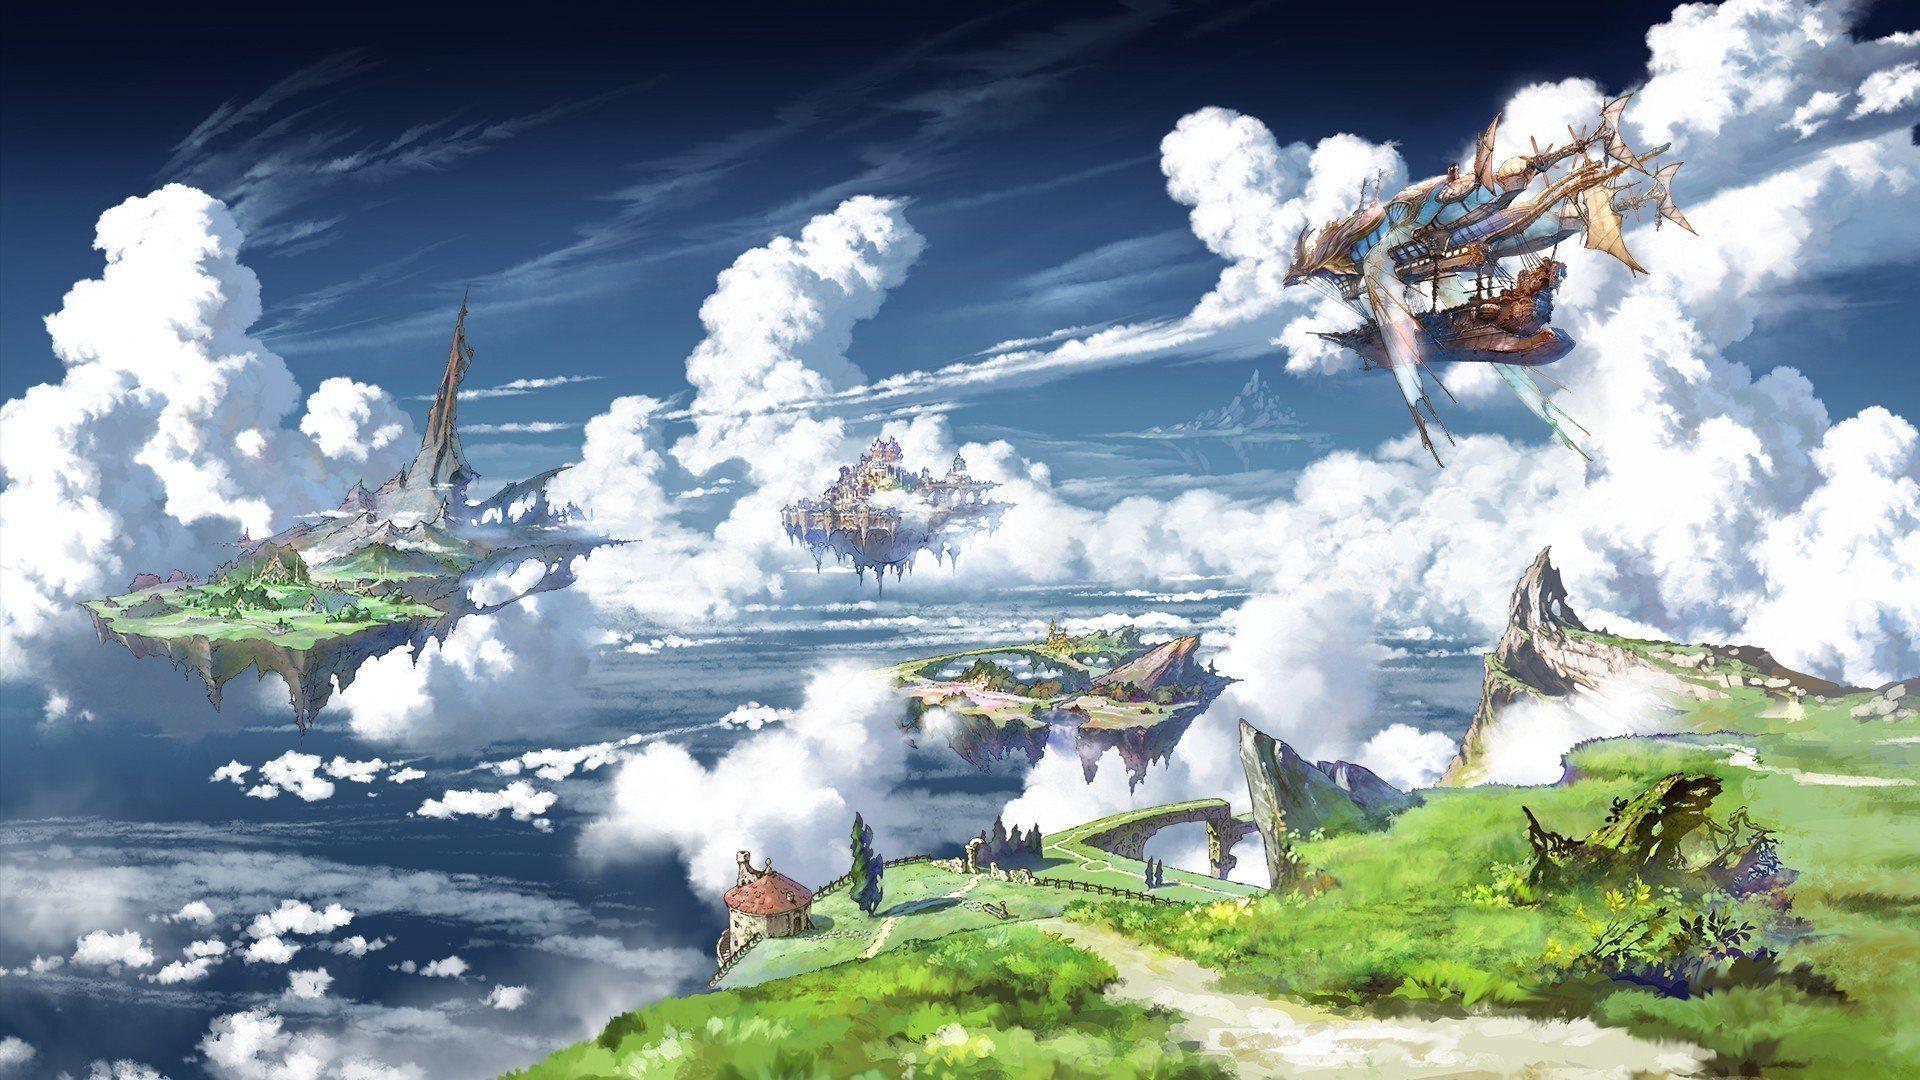 Anime Granblue Fantasy Sky Cloud Ship Floating Island